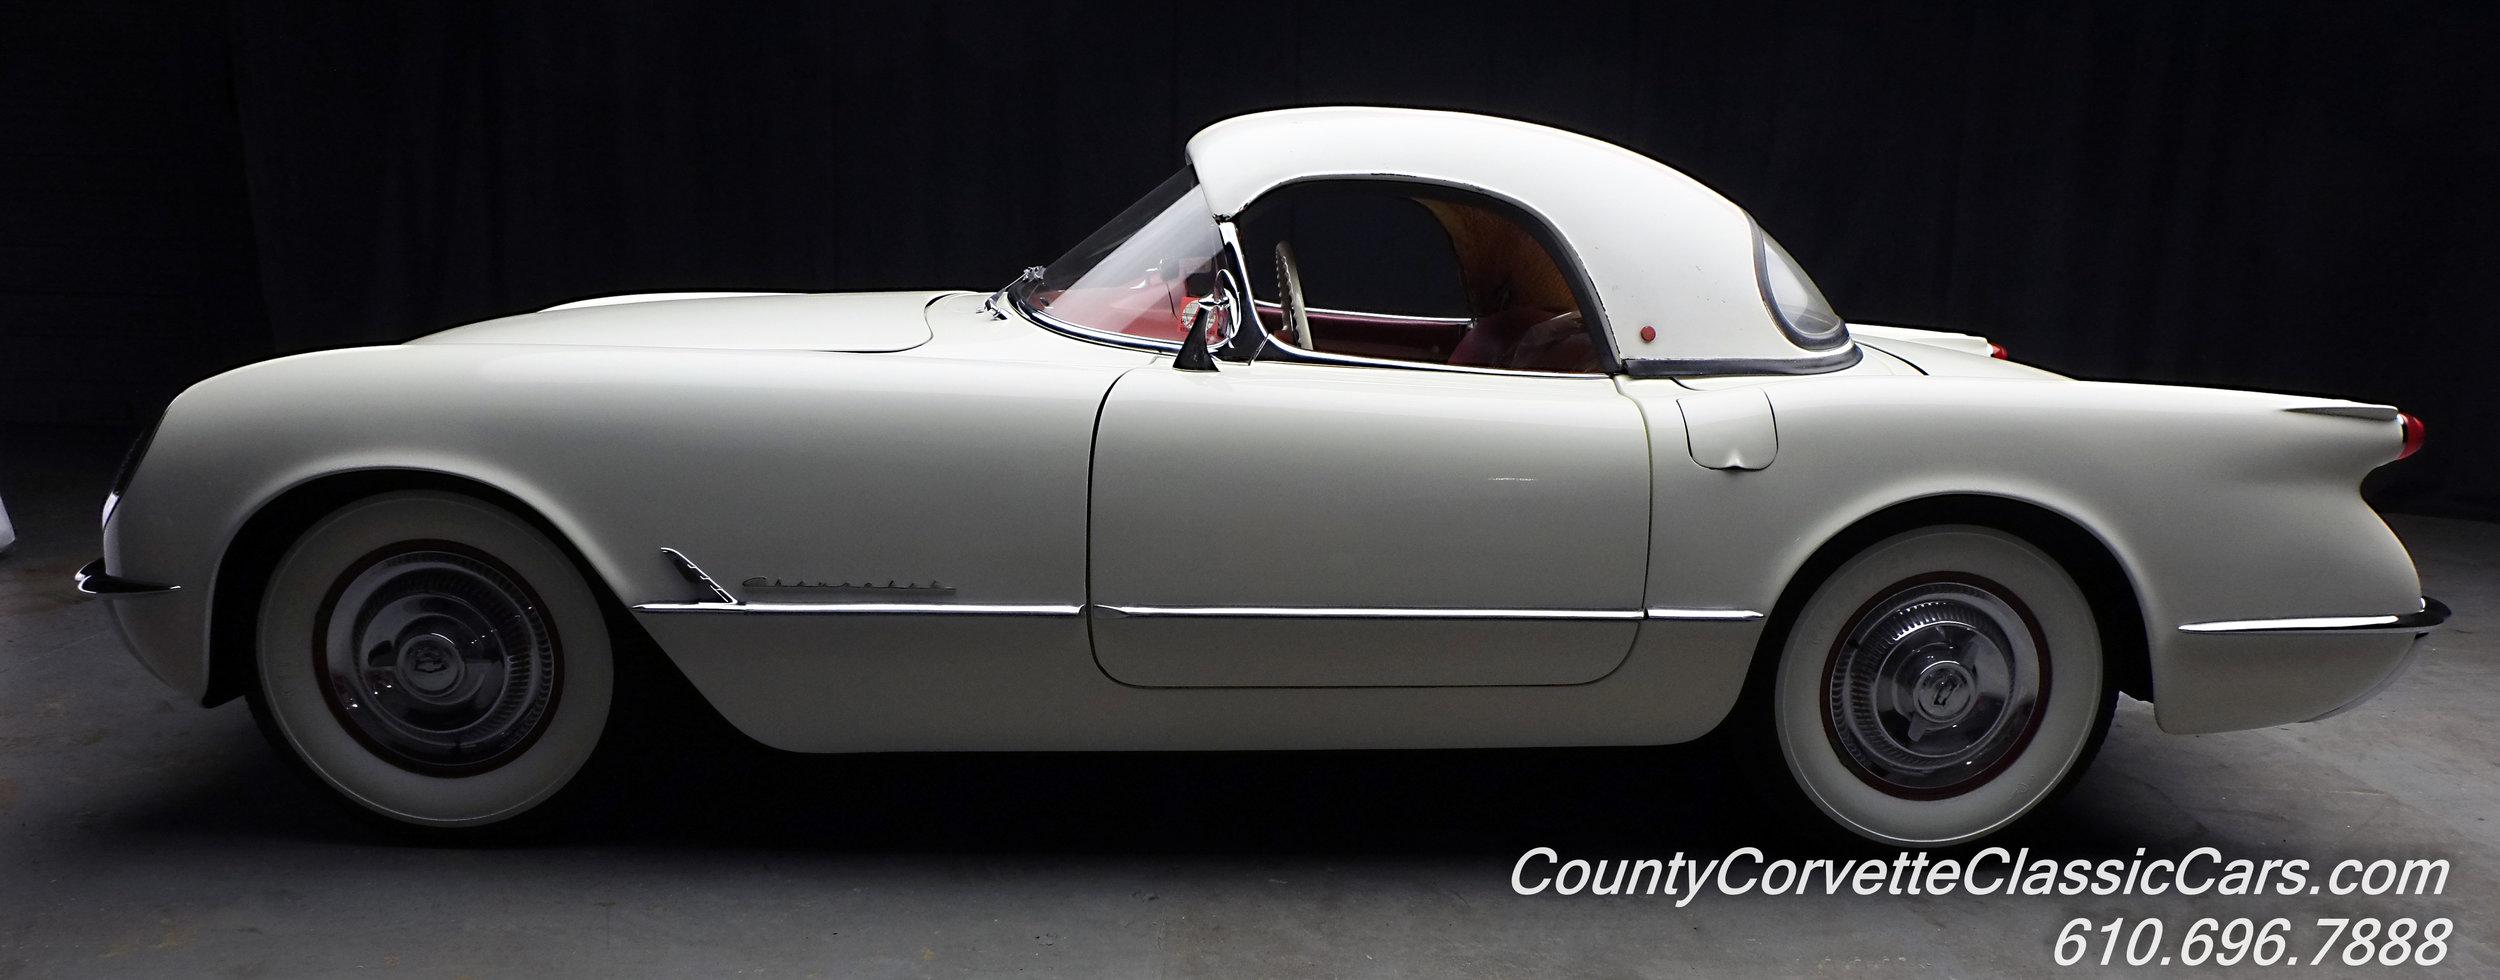 1953 Chevrolet Corvette White